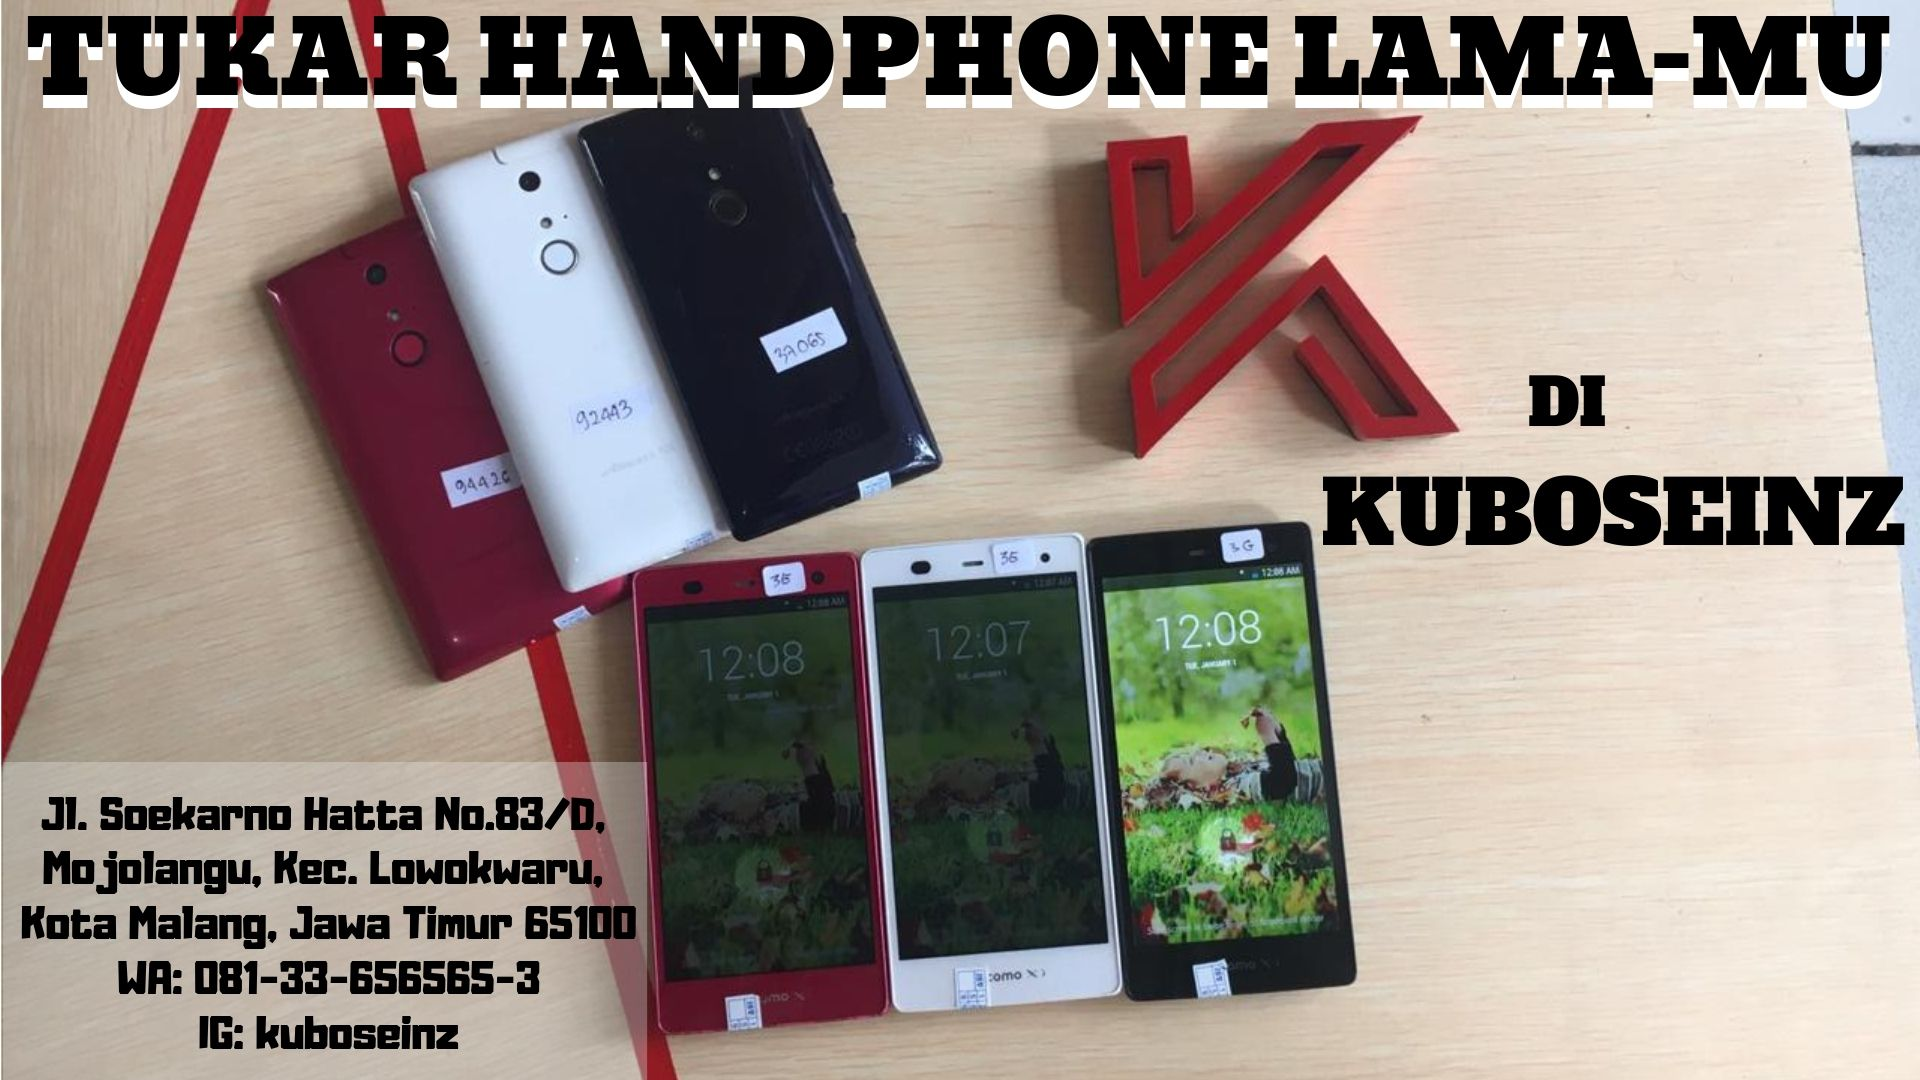 Harga Fantastis Iphone 6 Harga Malang Jual Iphone Hdc Malang